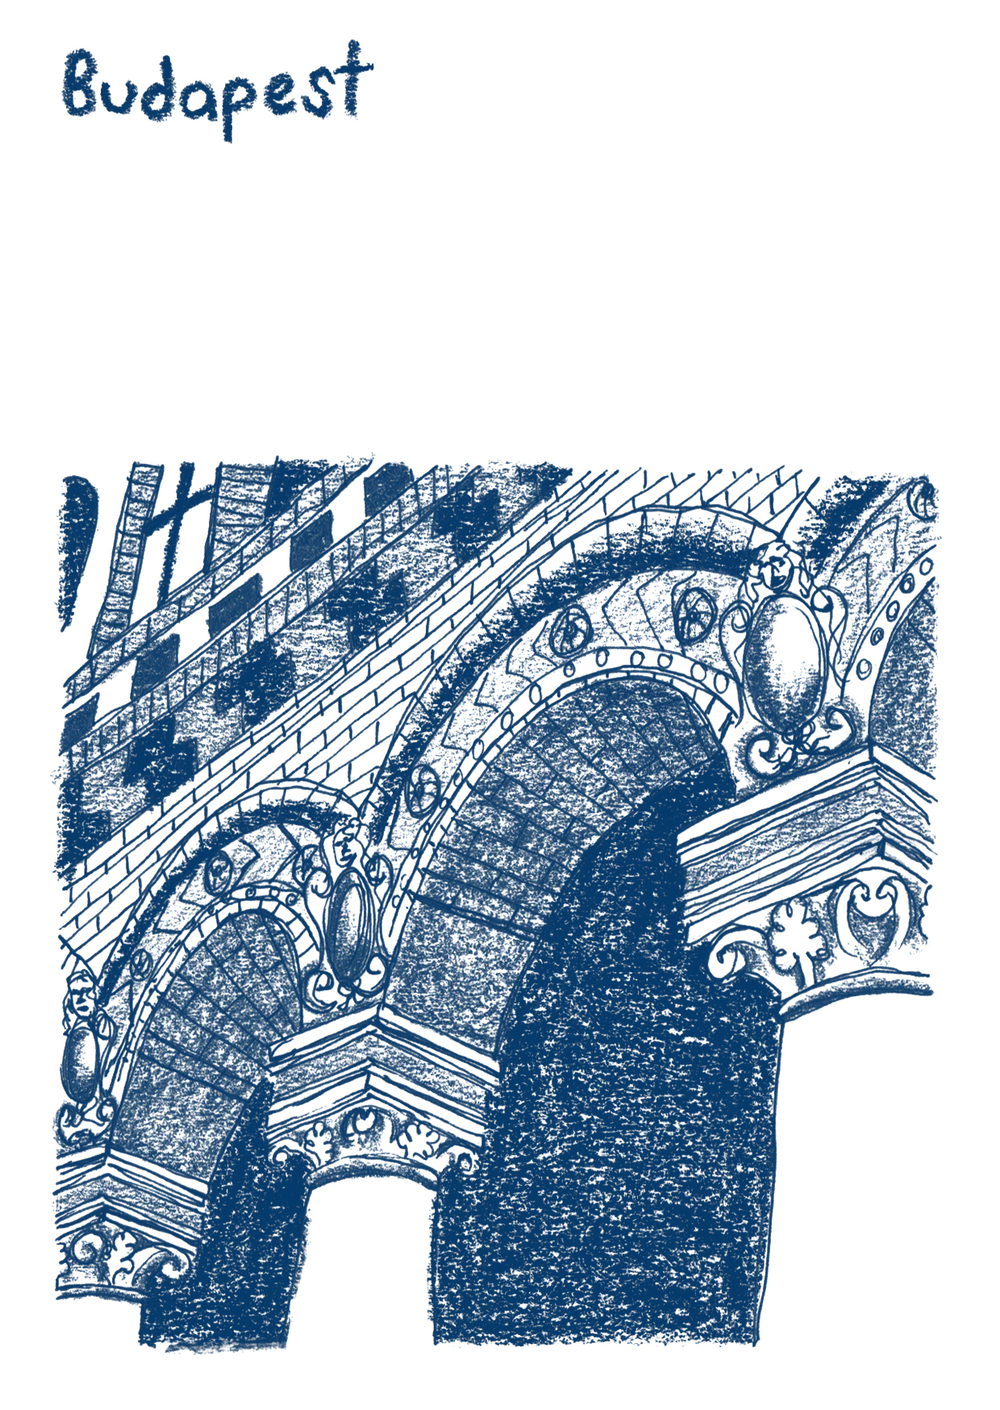 blue B zine Budapest page.jpg